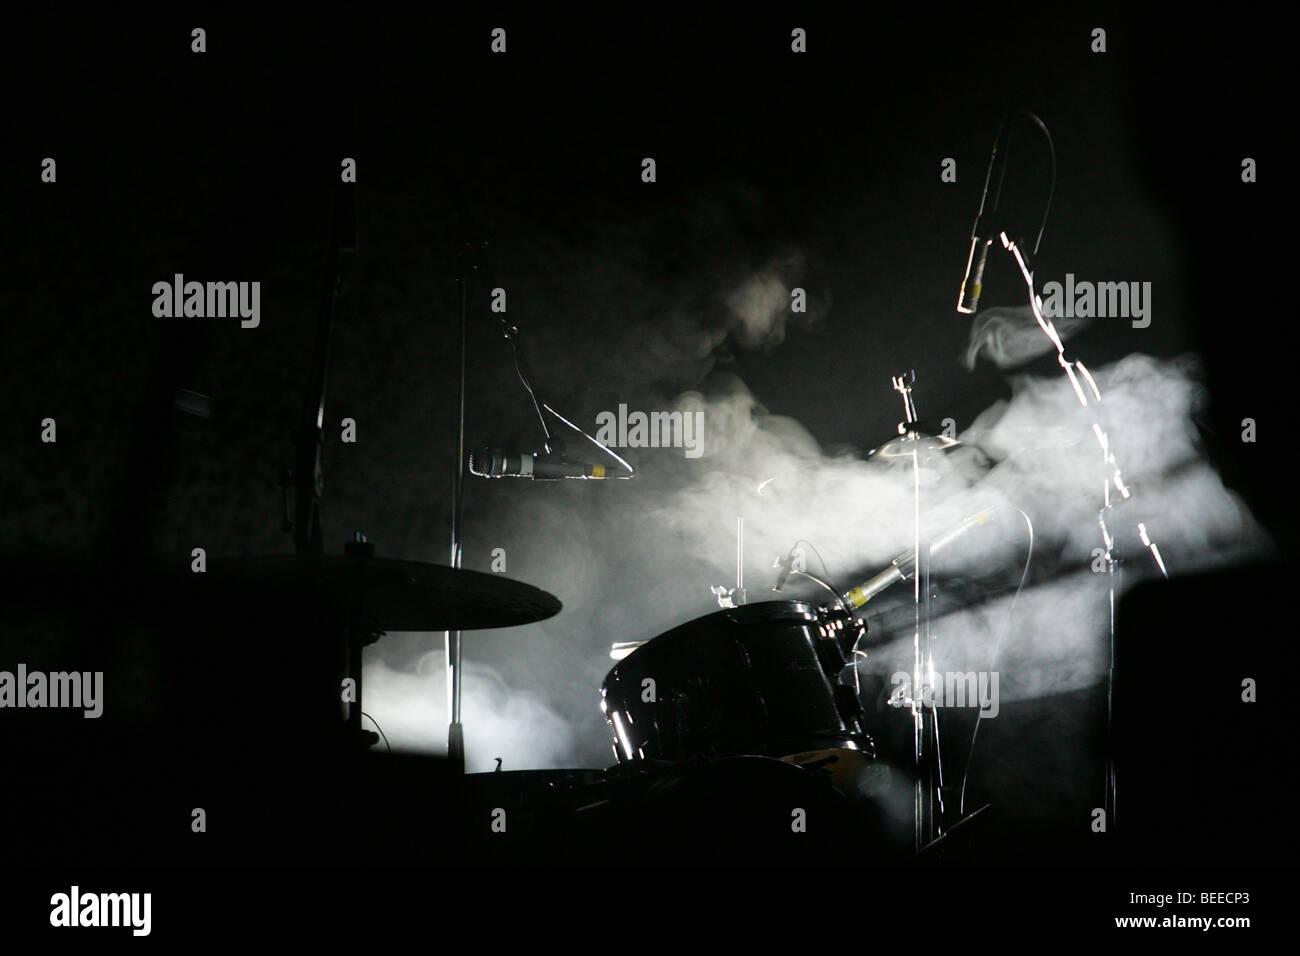 Drumkit - Stock Image